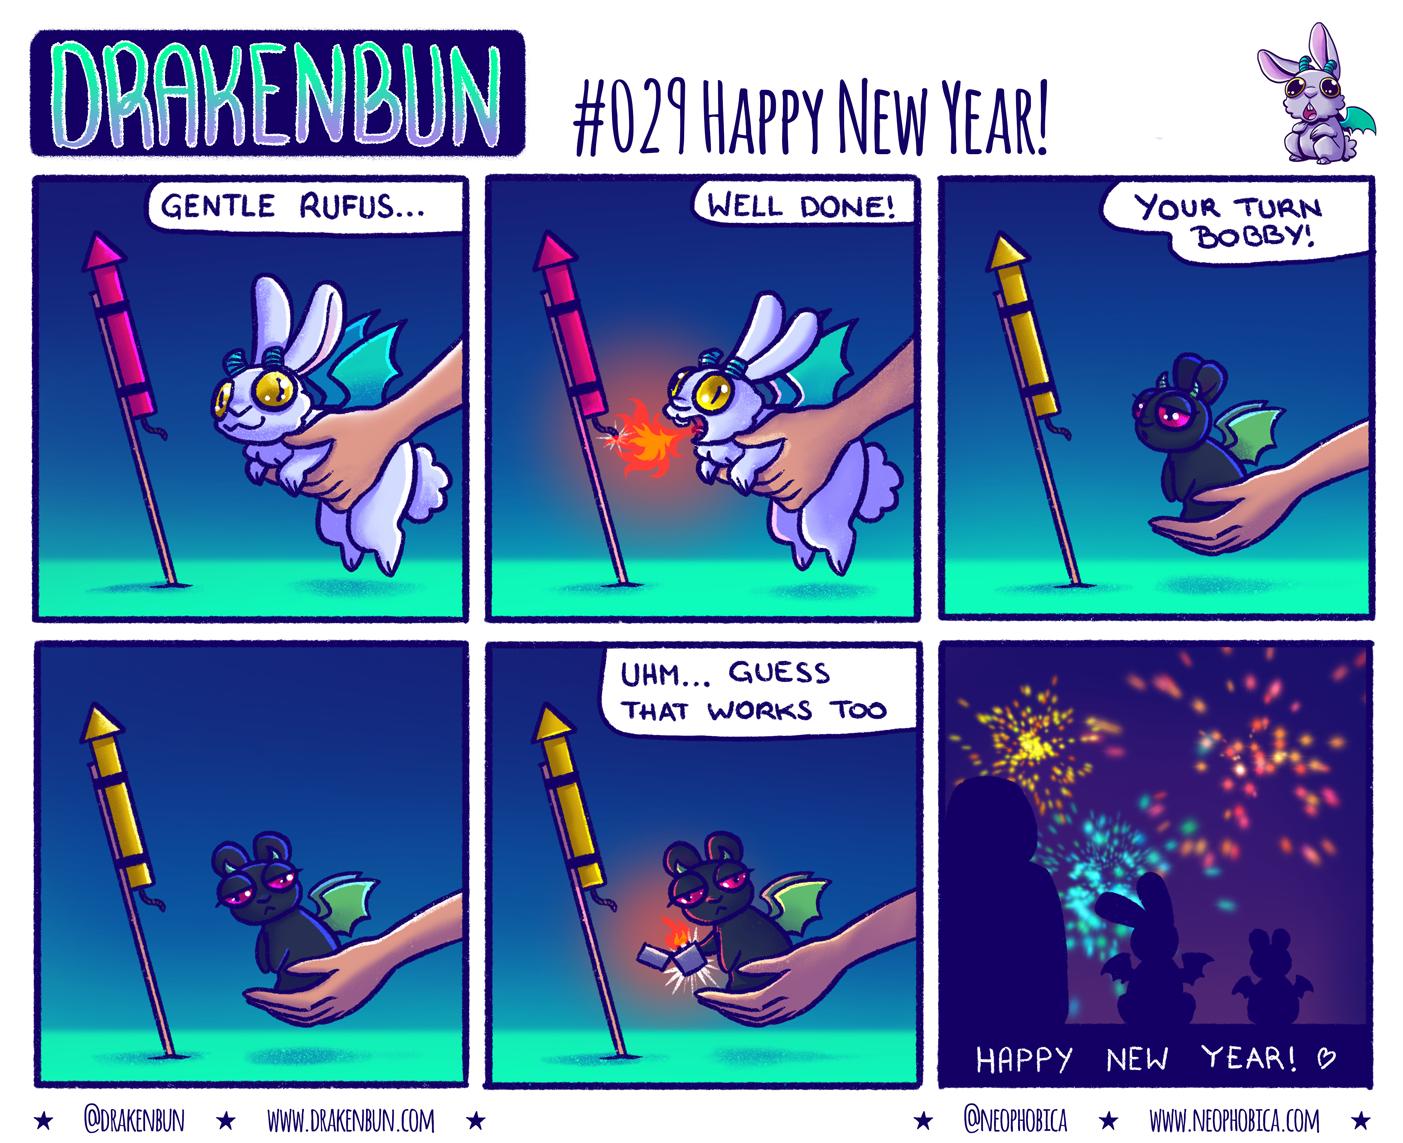 #029 Happy New Year